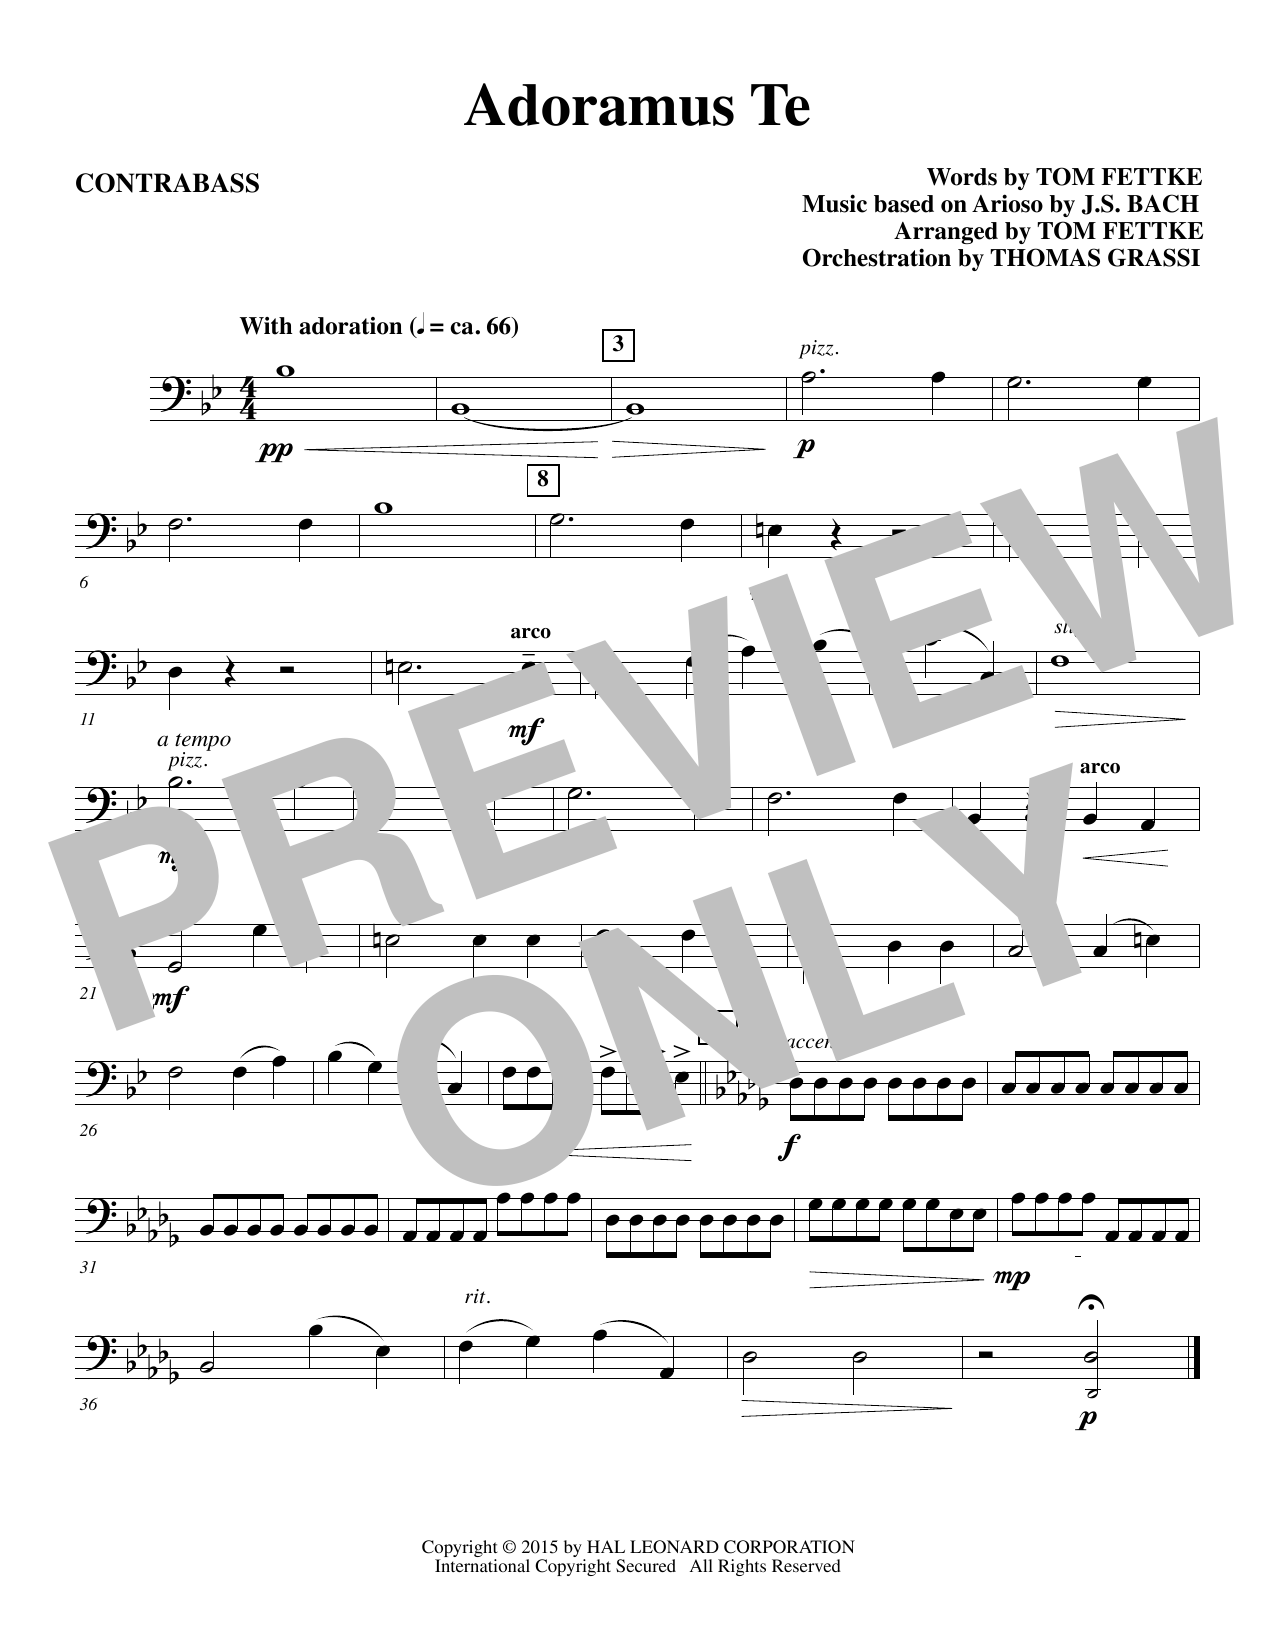 Tom Fettke Adoramus Te - Contrabass sheet music notes and chords. Download Printable PDF.